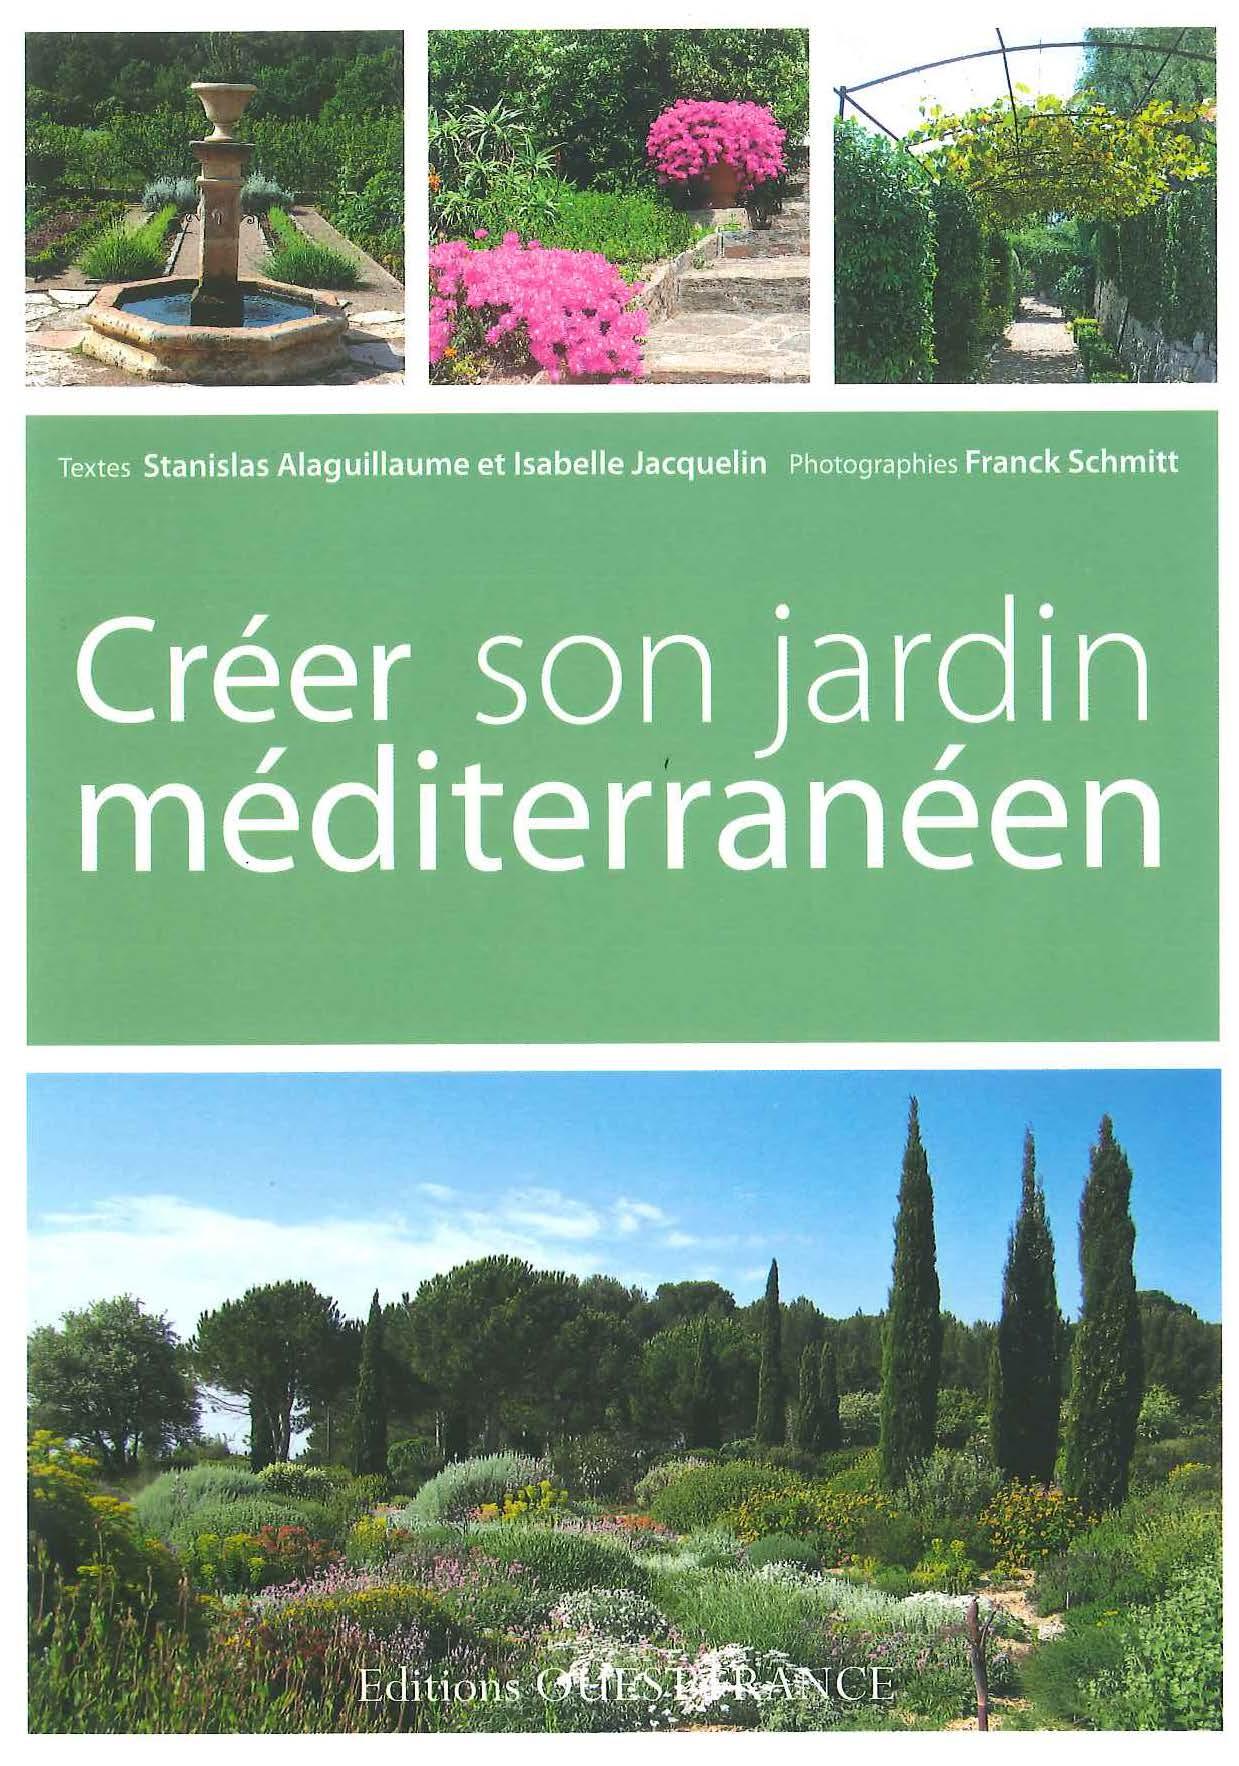 Créer son jardin méditerranéen